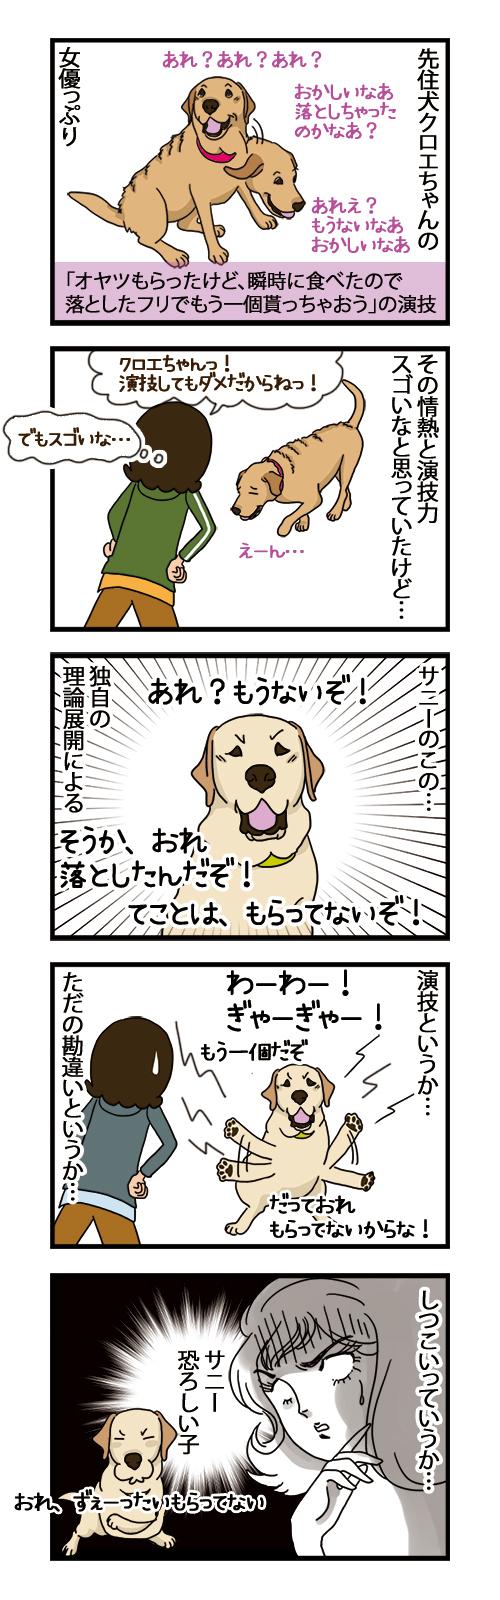 21062021_dogcomic.jpg